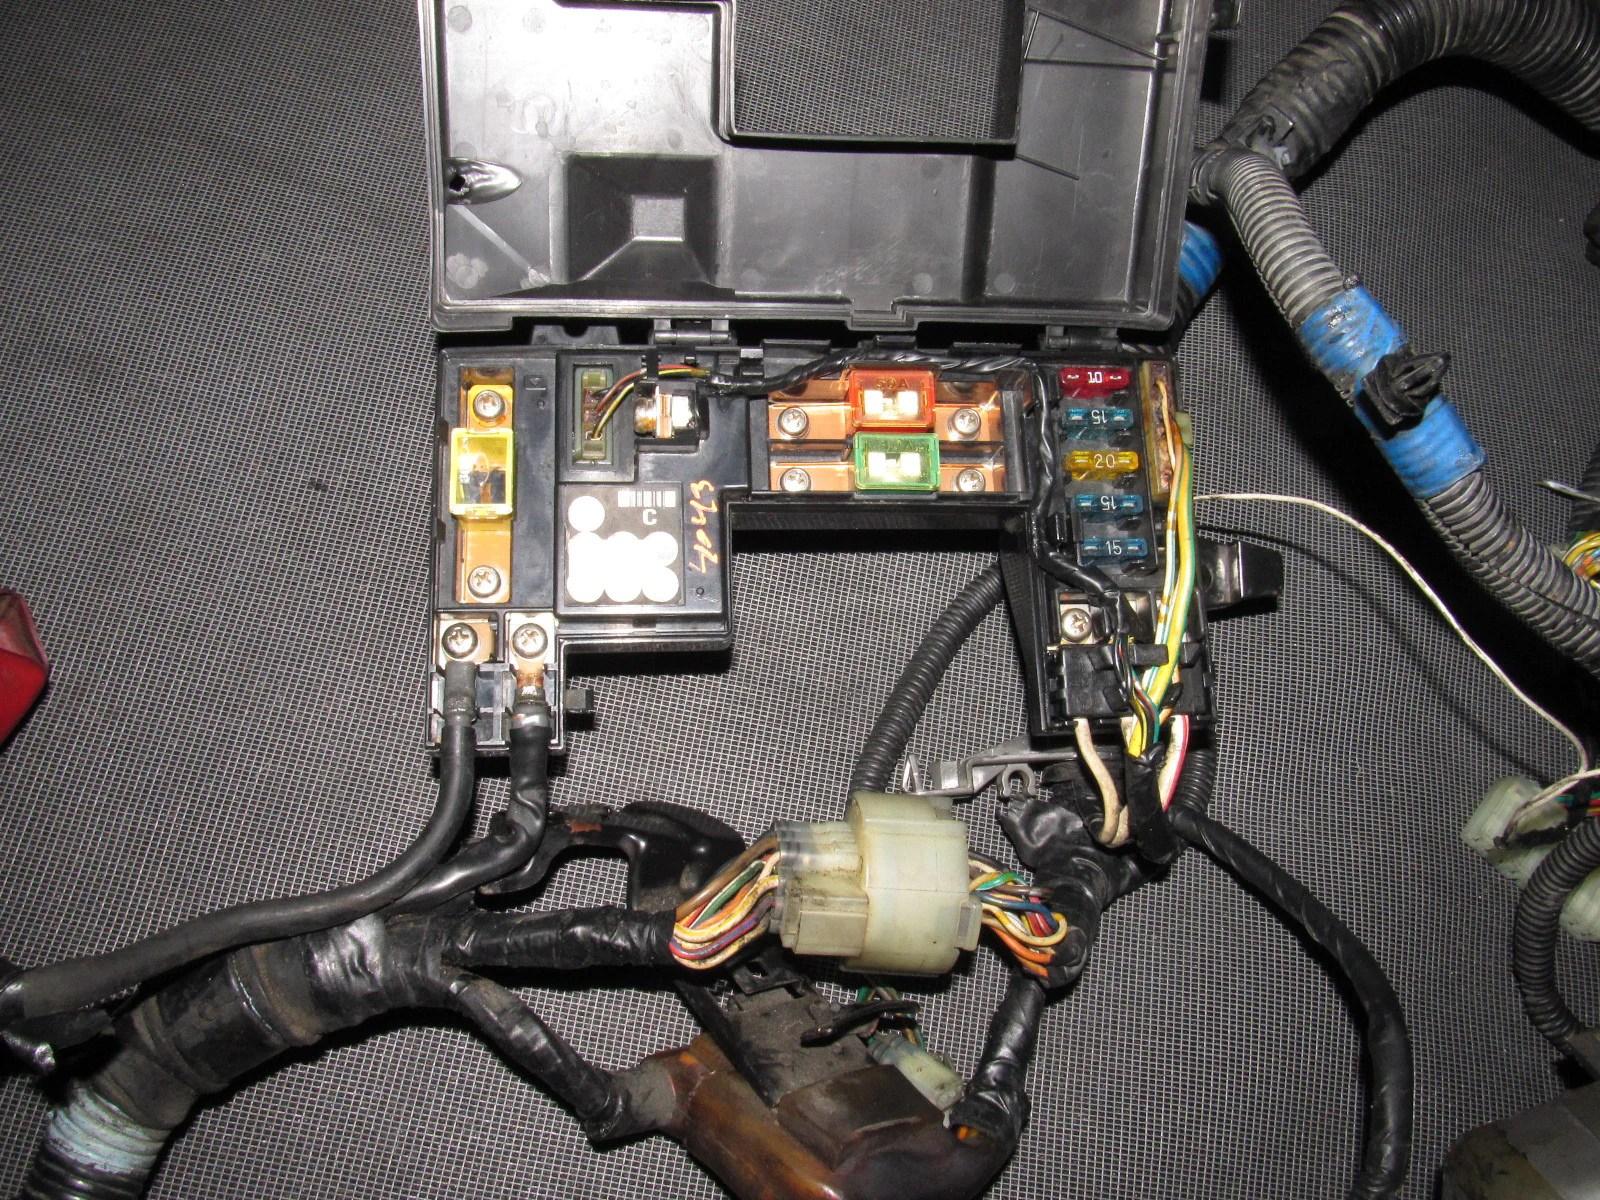 honda crx wiring harness wiring diagram expert on 1970 chevelle ss wiring harness diagram 91 crx si  [ 1600 x 1200 Pixel ]